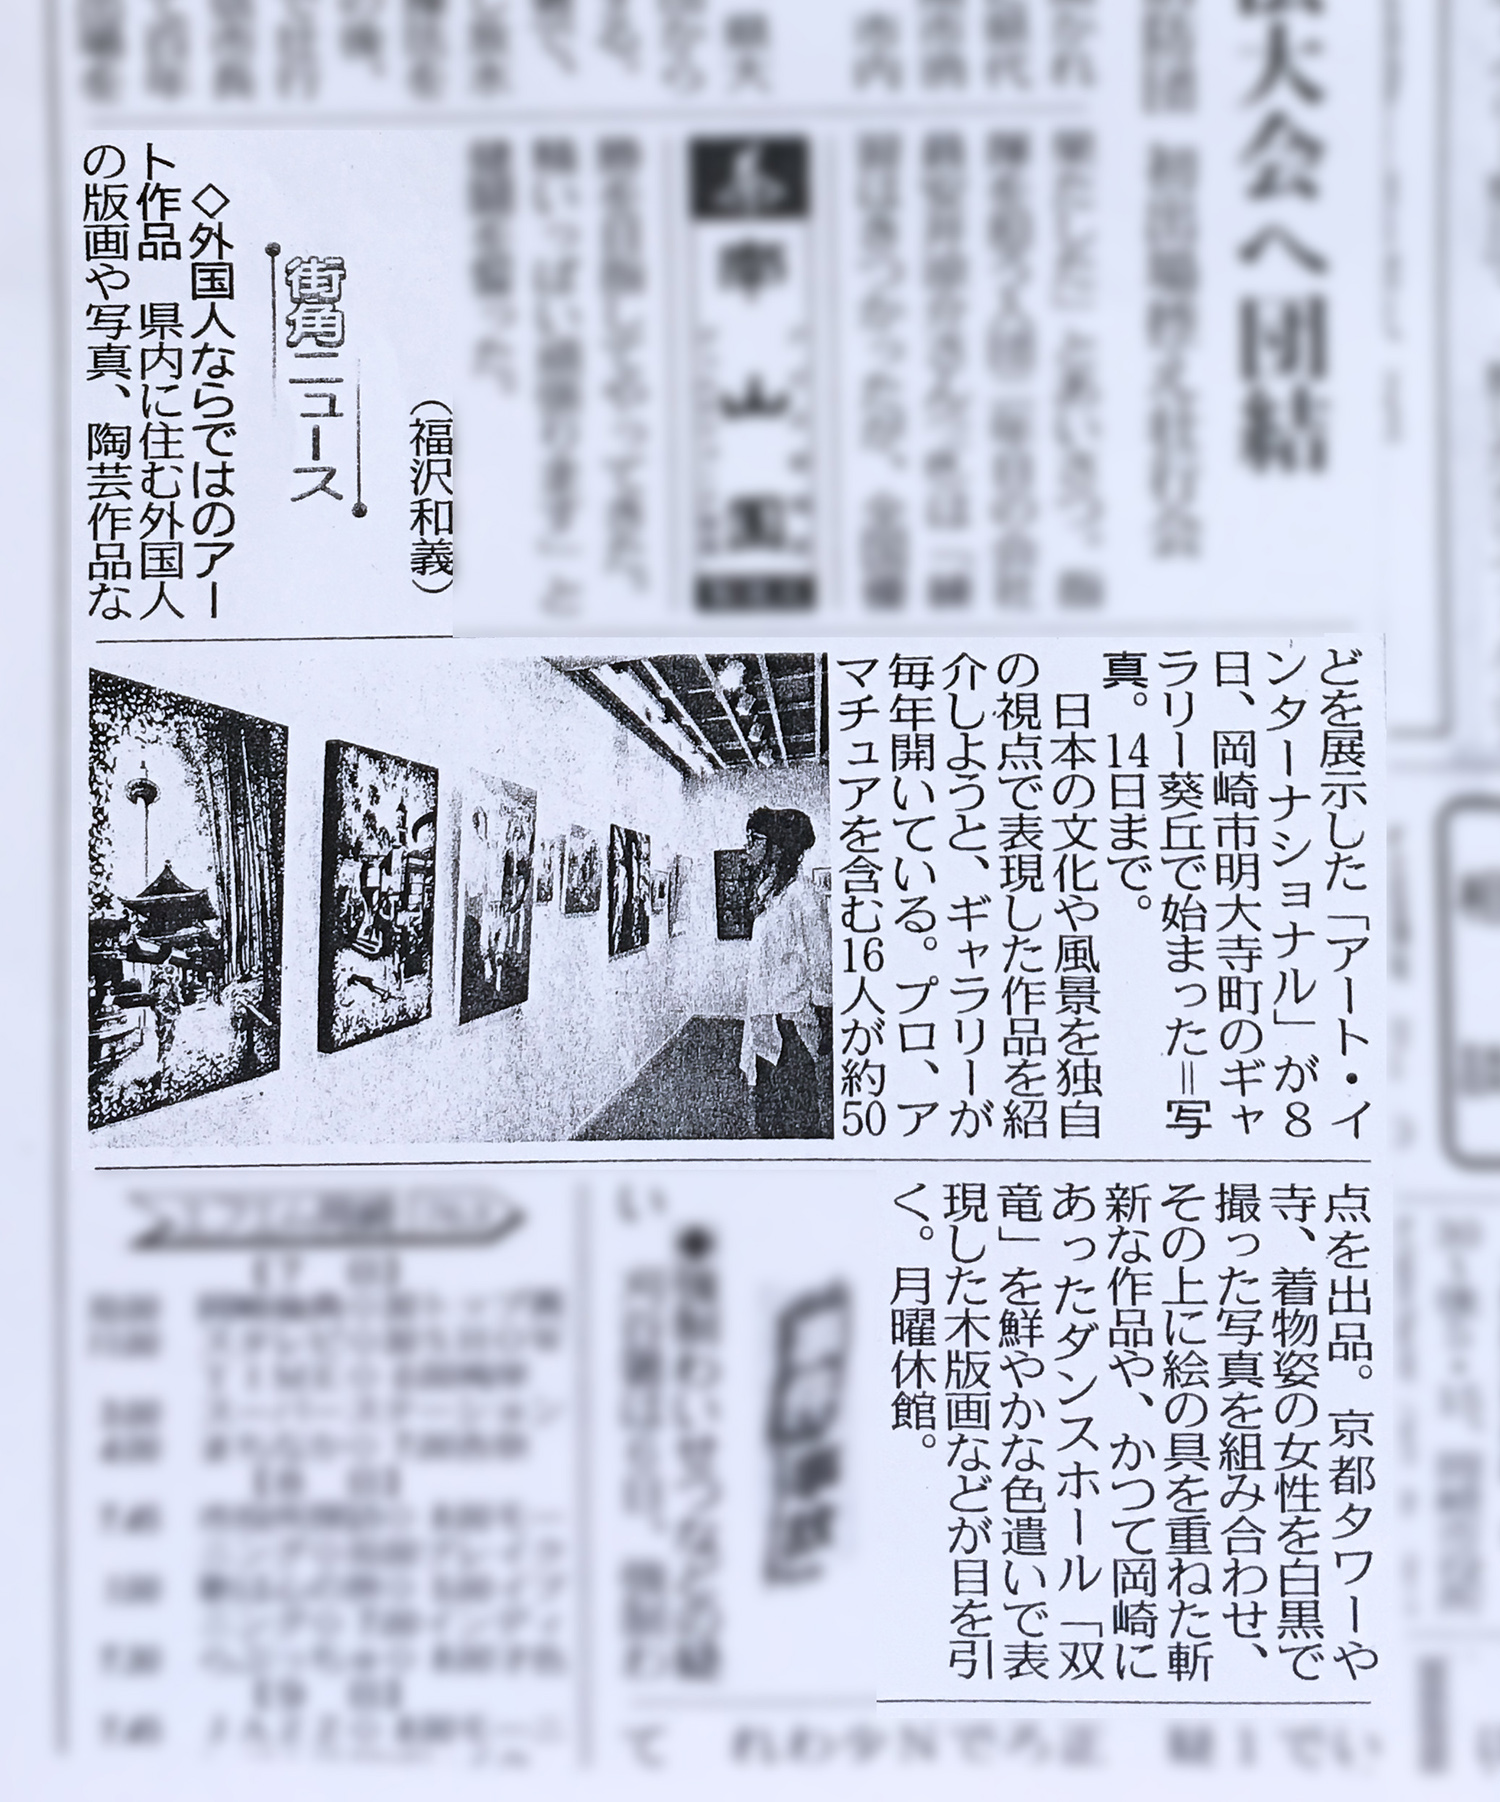 tokai-aichi-newspaper-october2018.jpg